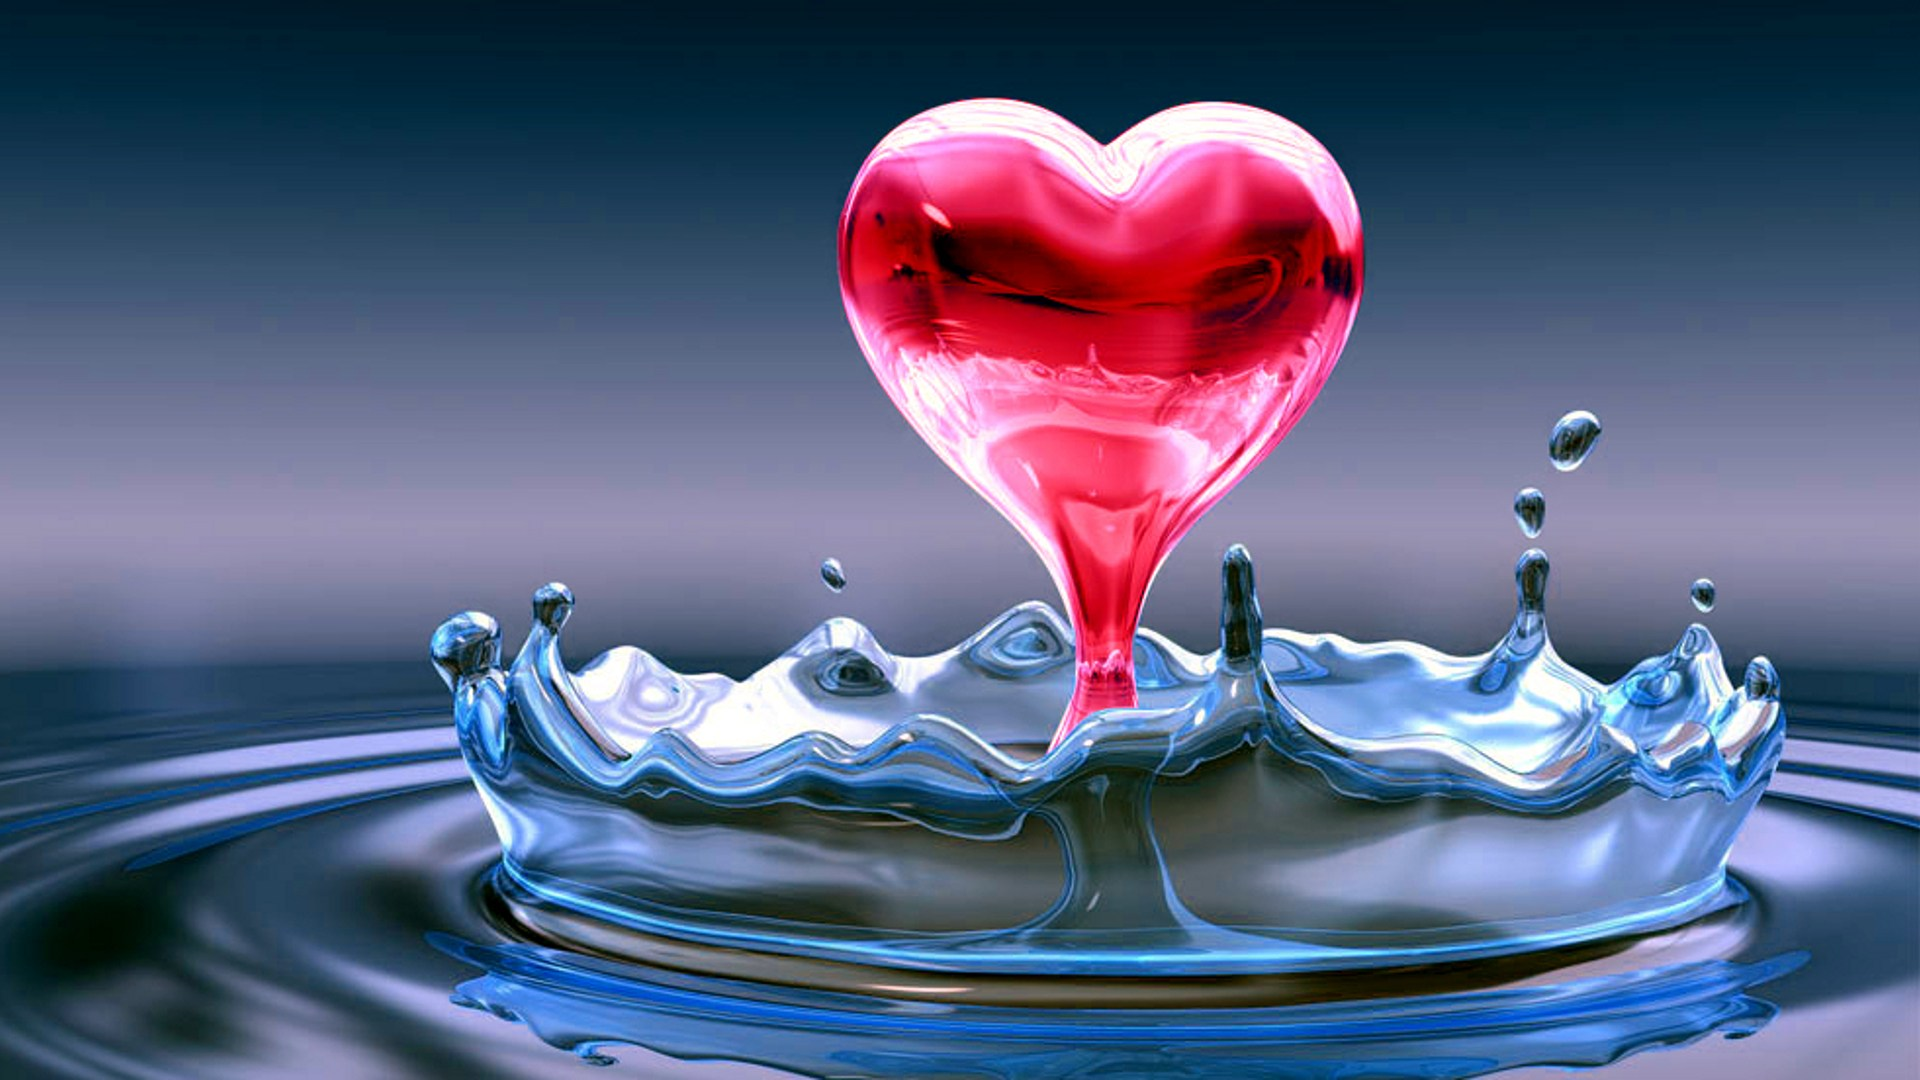 Image coeur full hd - coeur, water heart, rouge, 3D, eau, amour, love